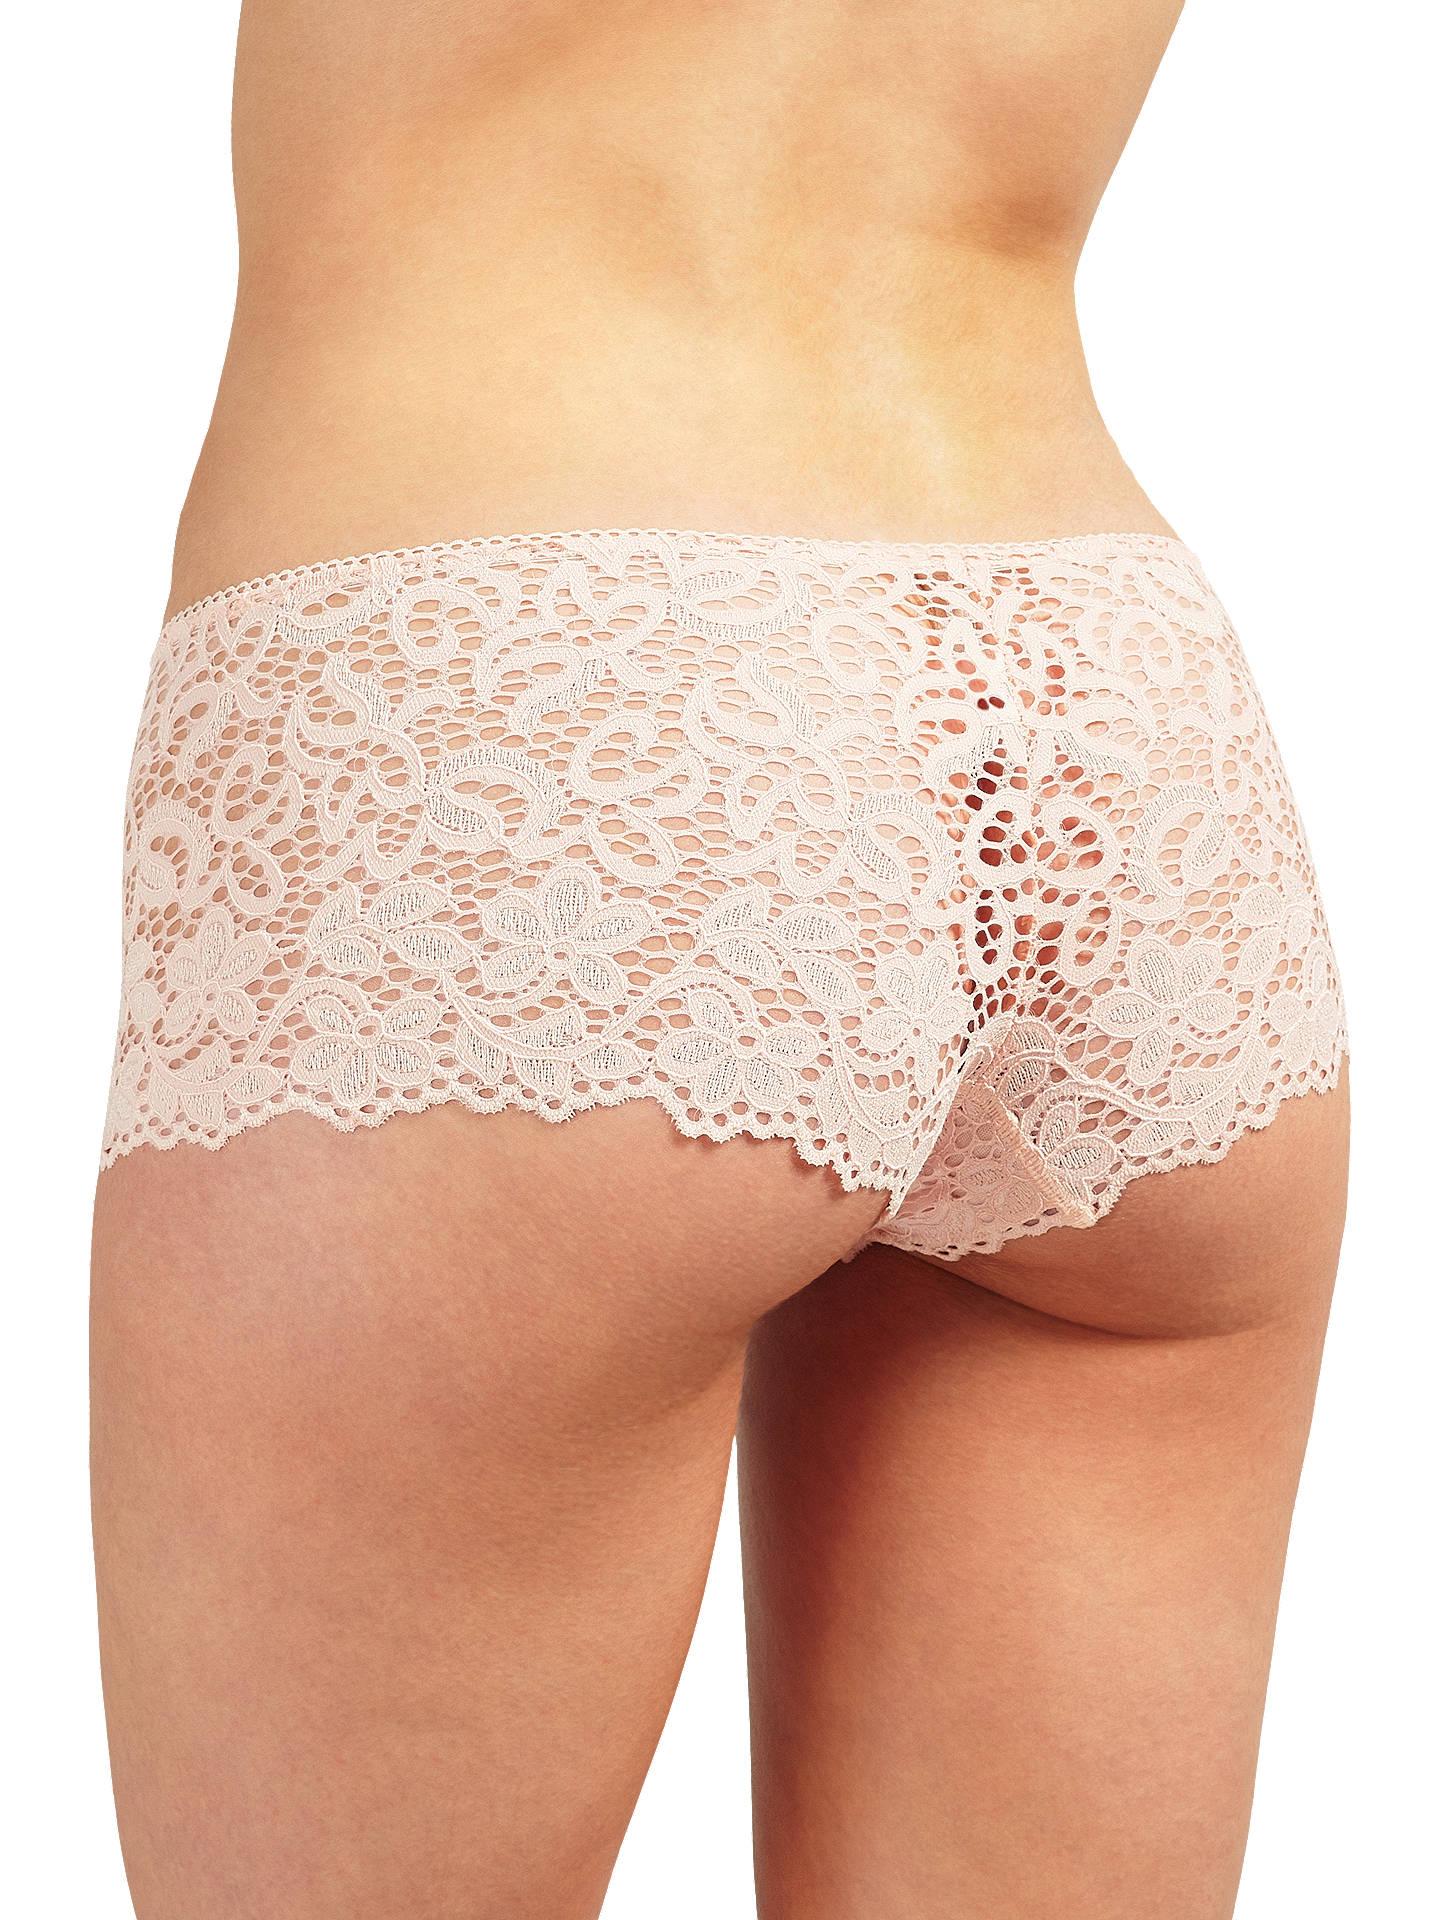 edfd587bdde ... Buy DKNY Classic Lace Boy Shorts, Blush, S Online at johnlewis.com ...